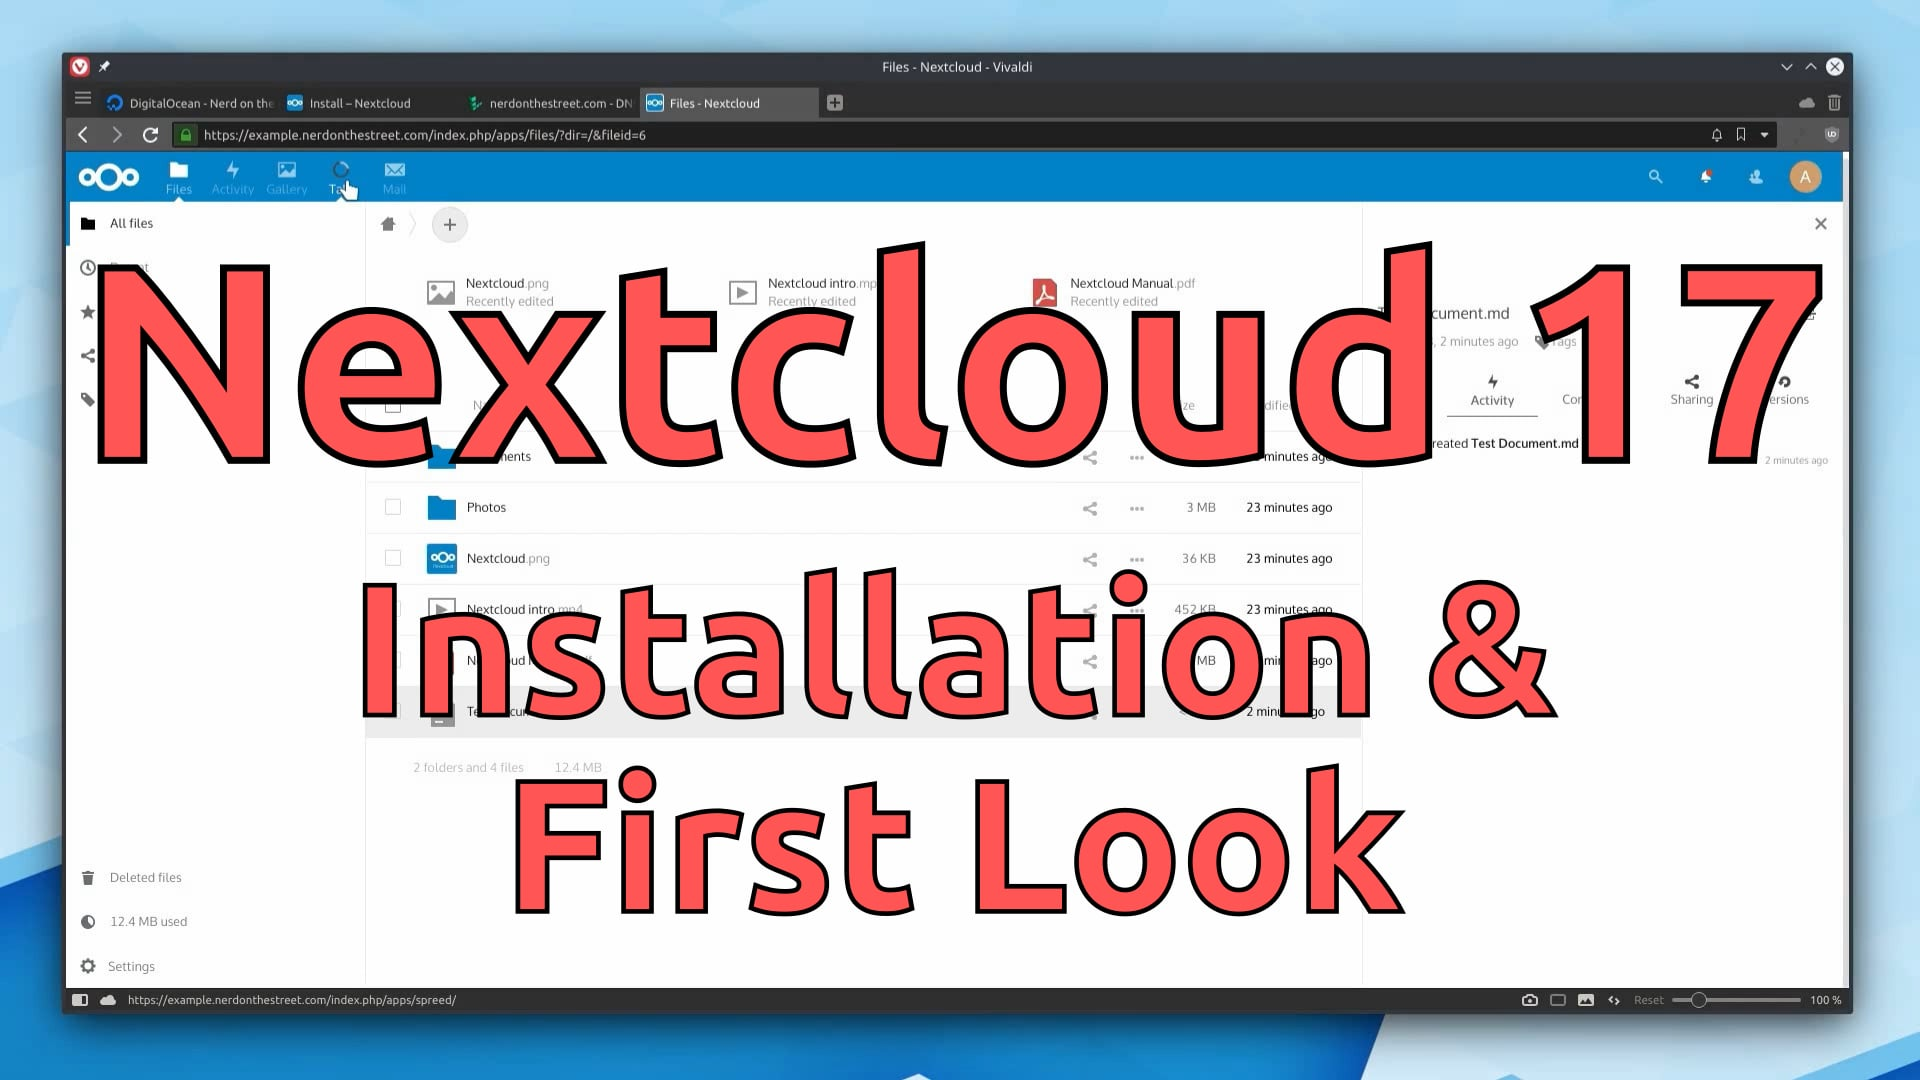 Nextcloud 17 on Debian 10 (Installation & First Look)